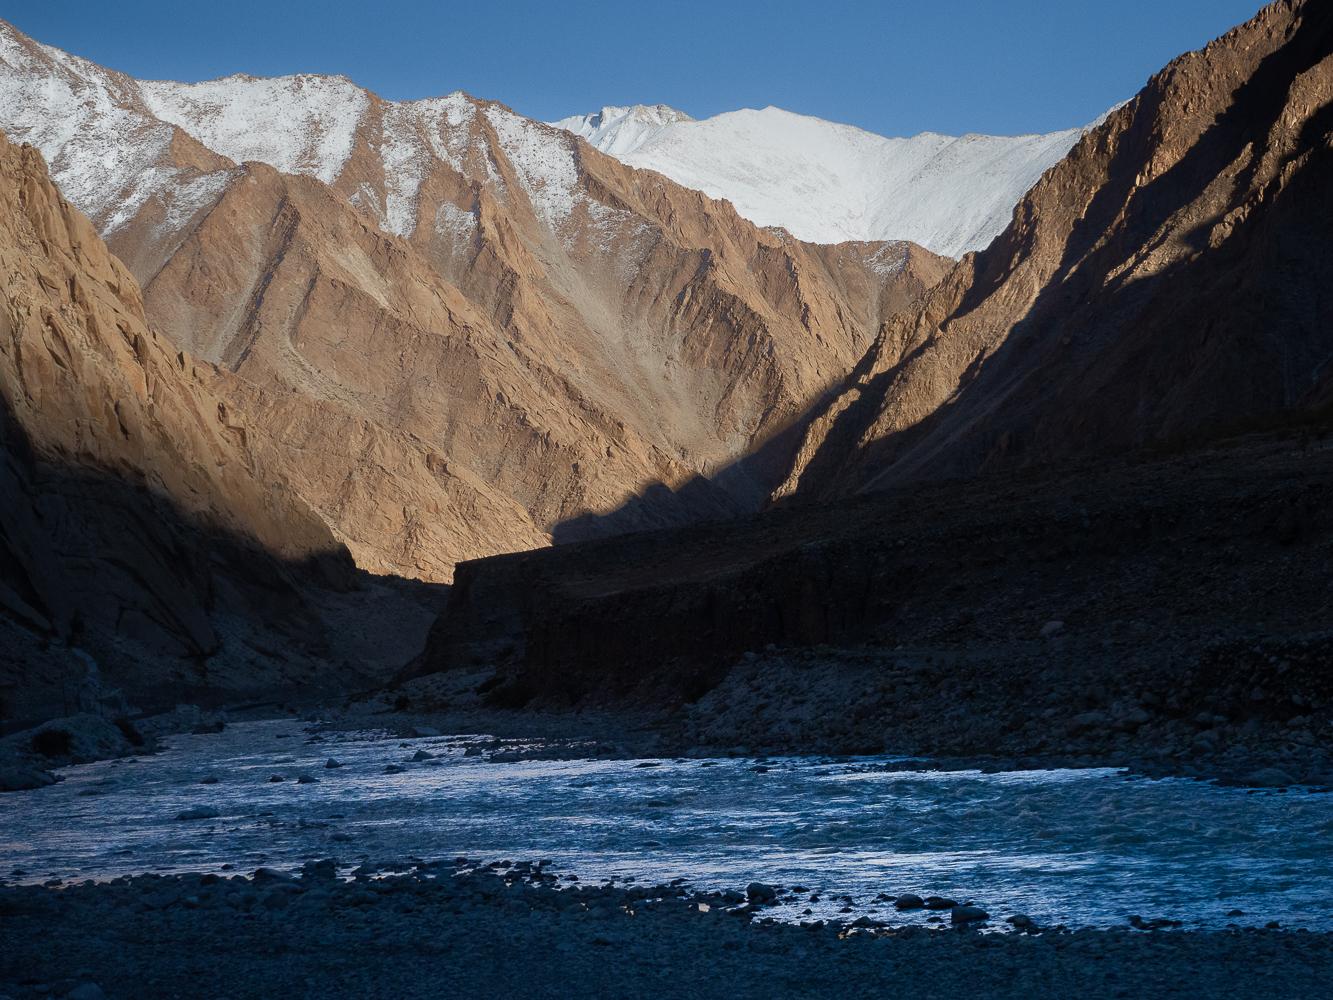 Indus on the way to Tsa moriri lake, India